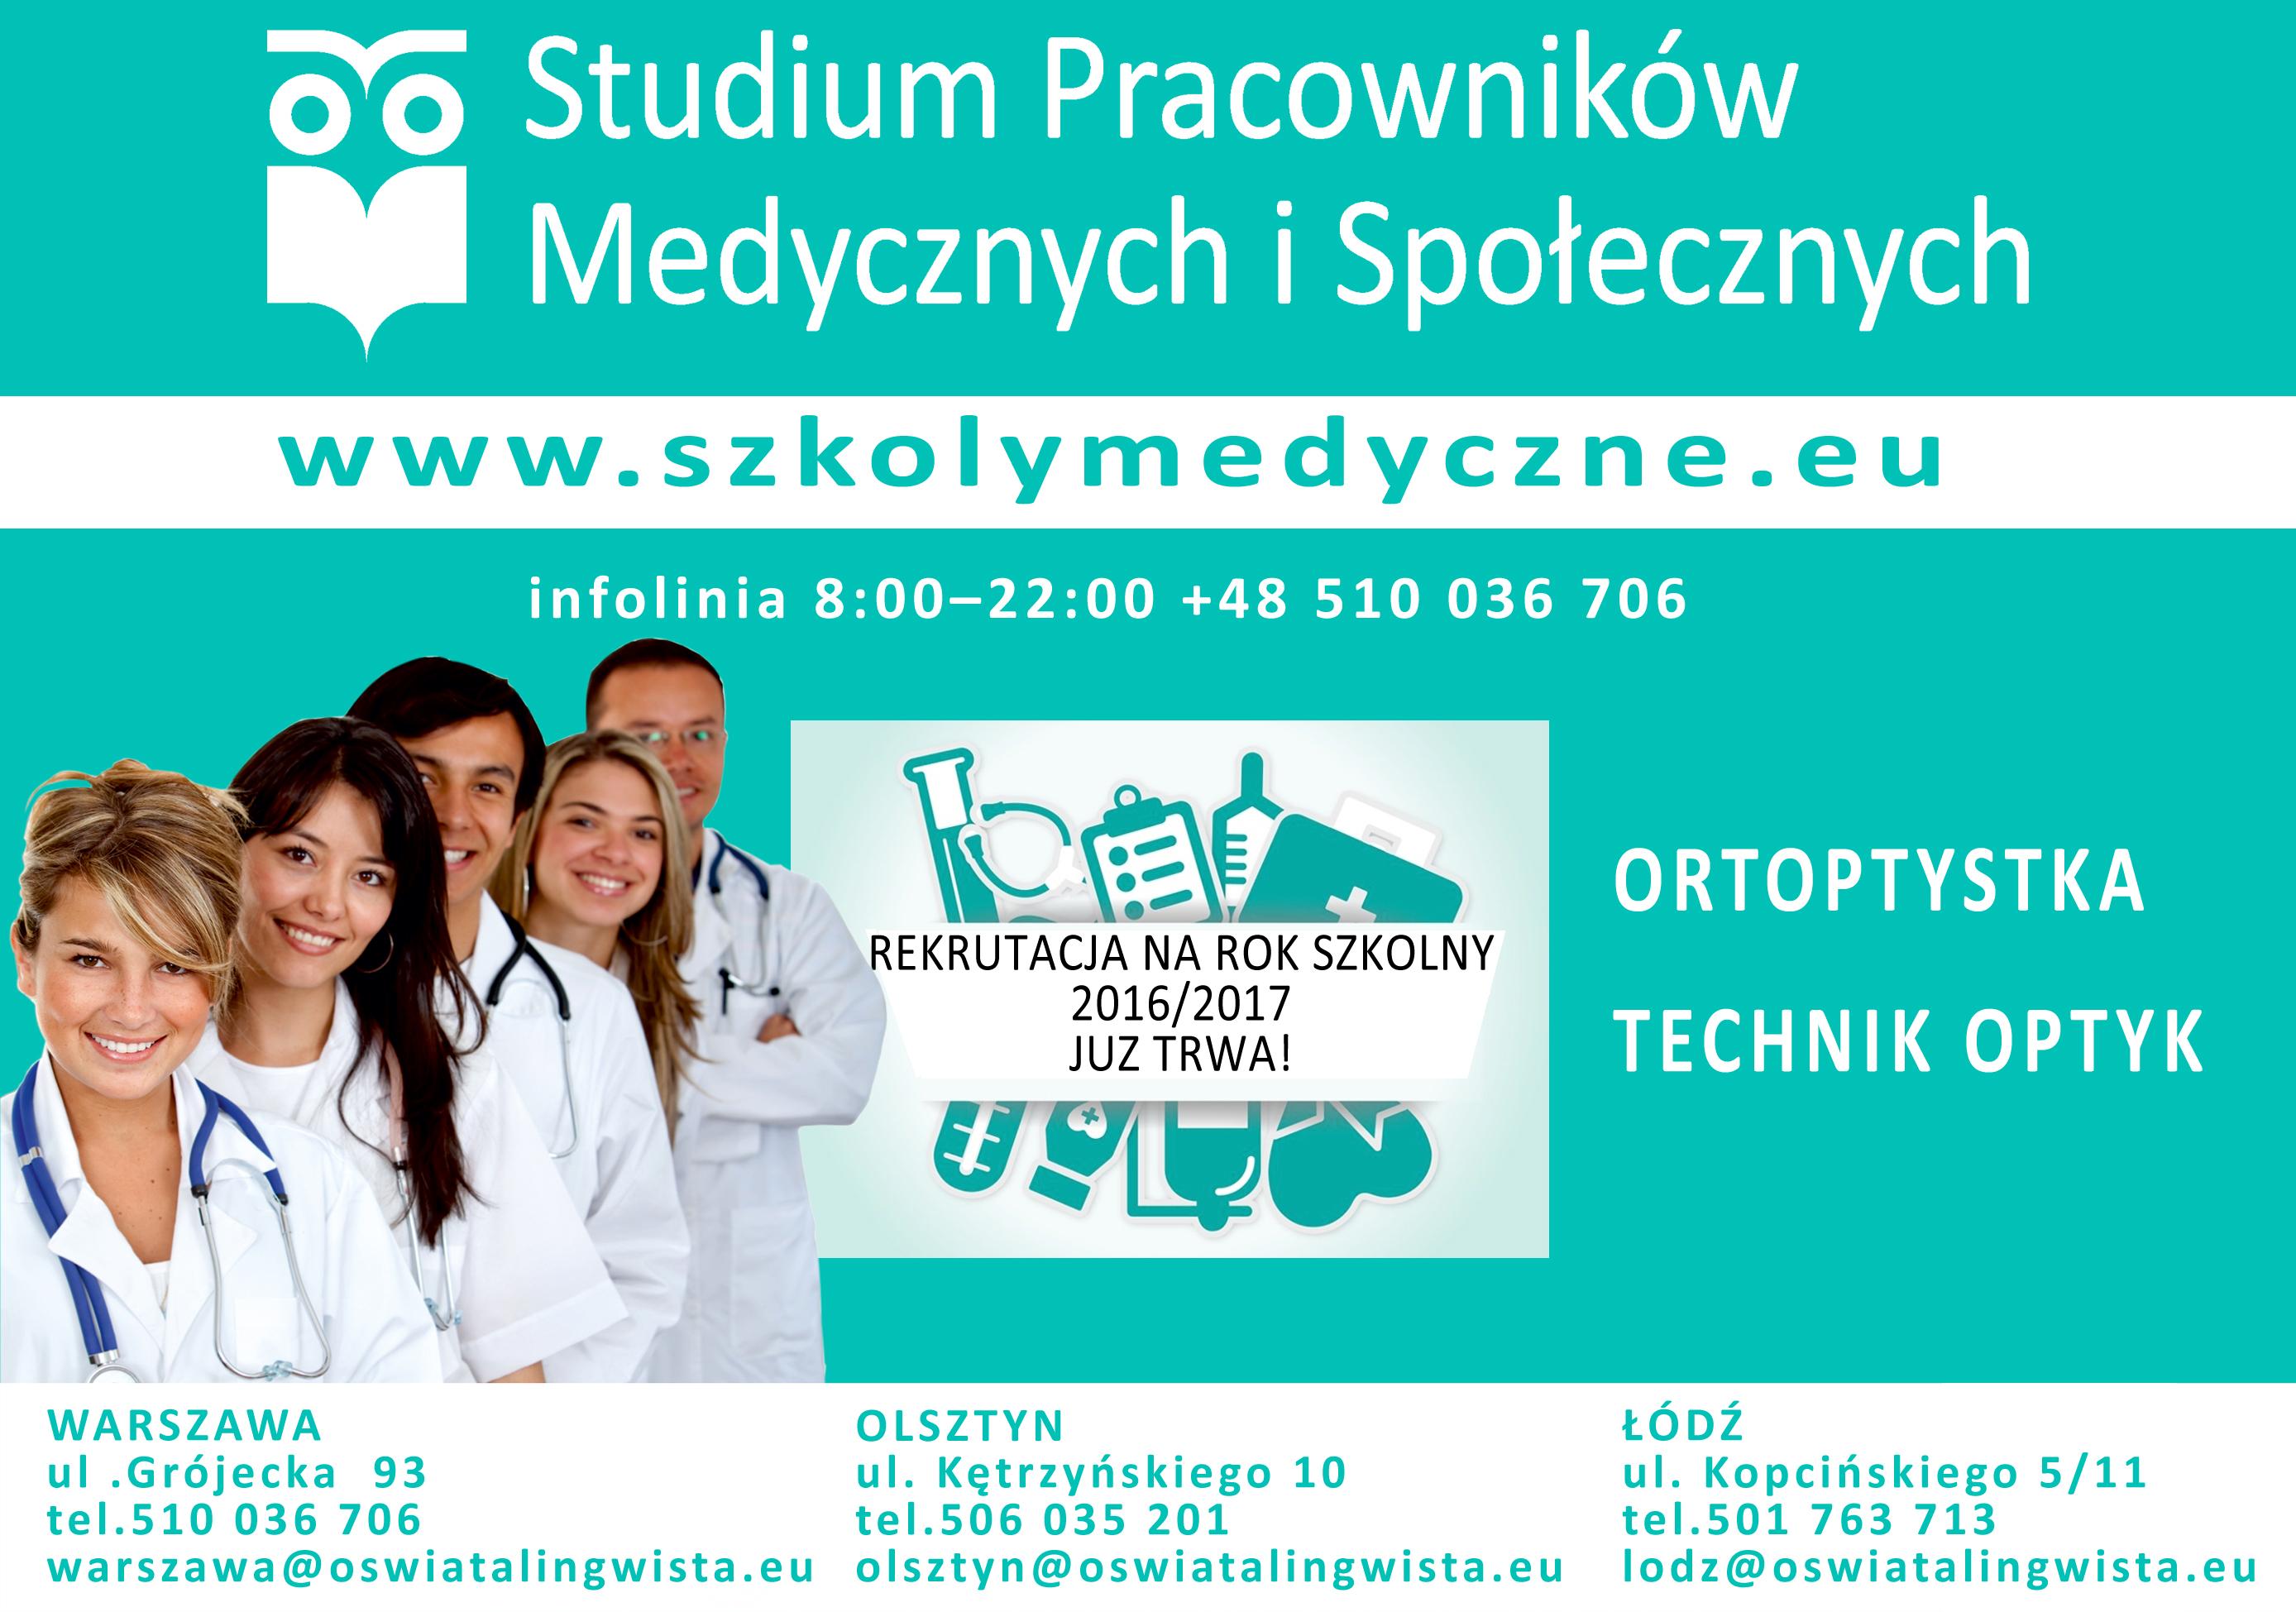 ortoptystka reklama